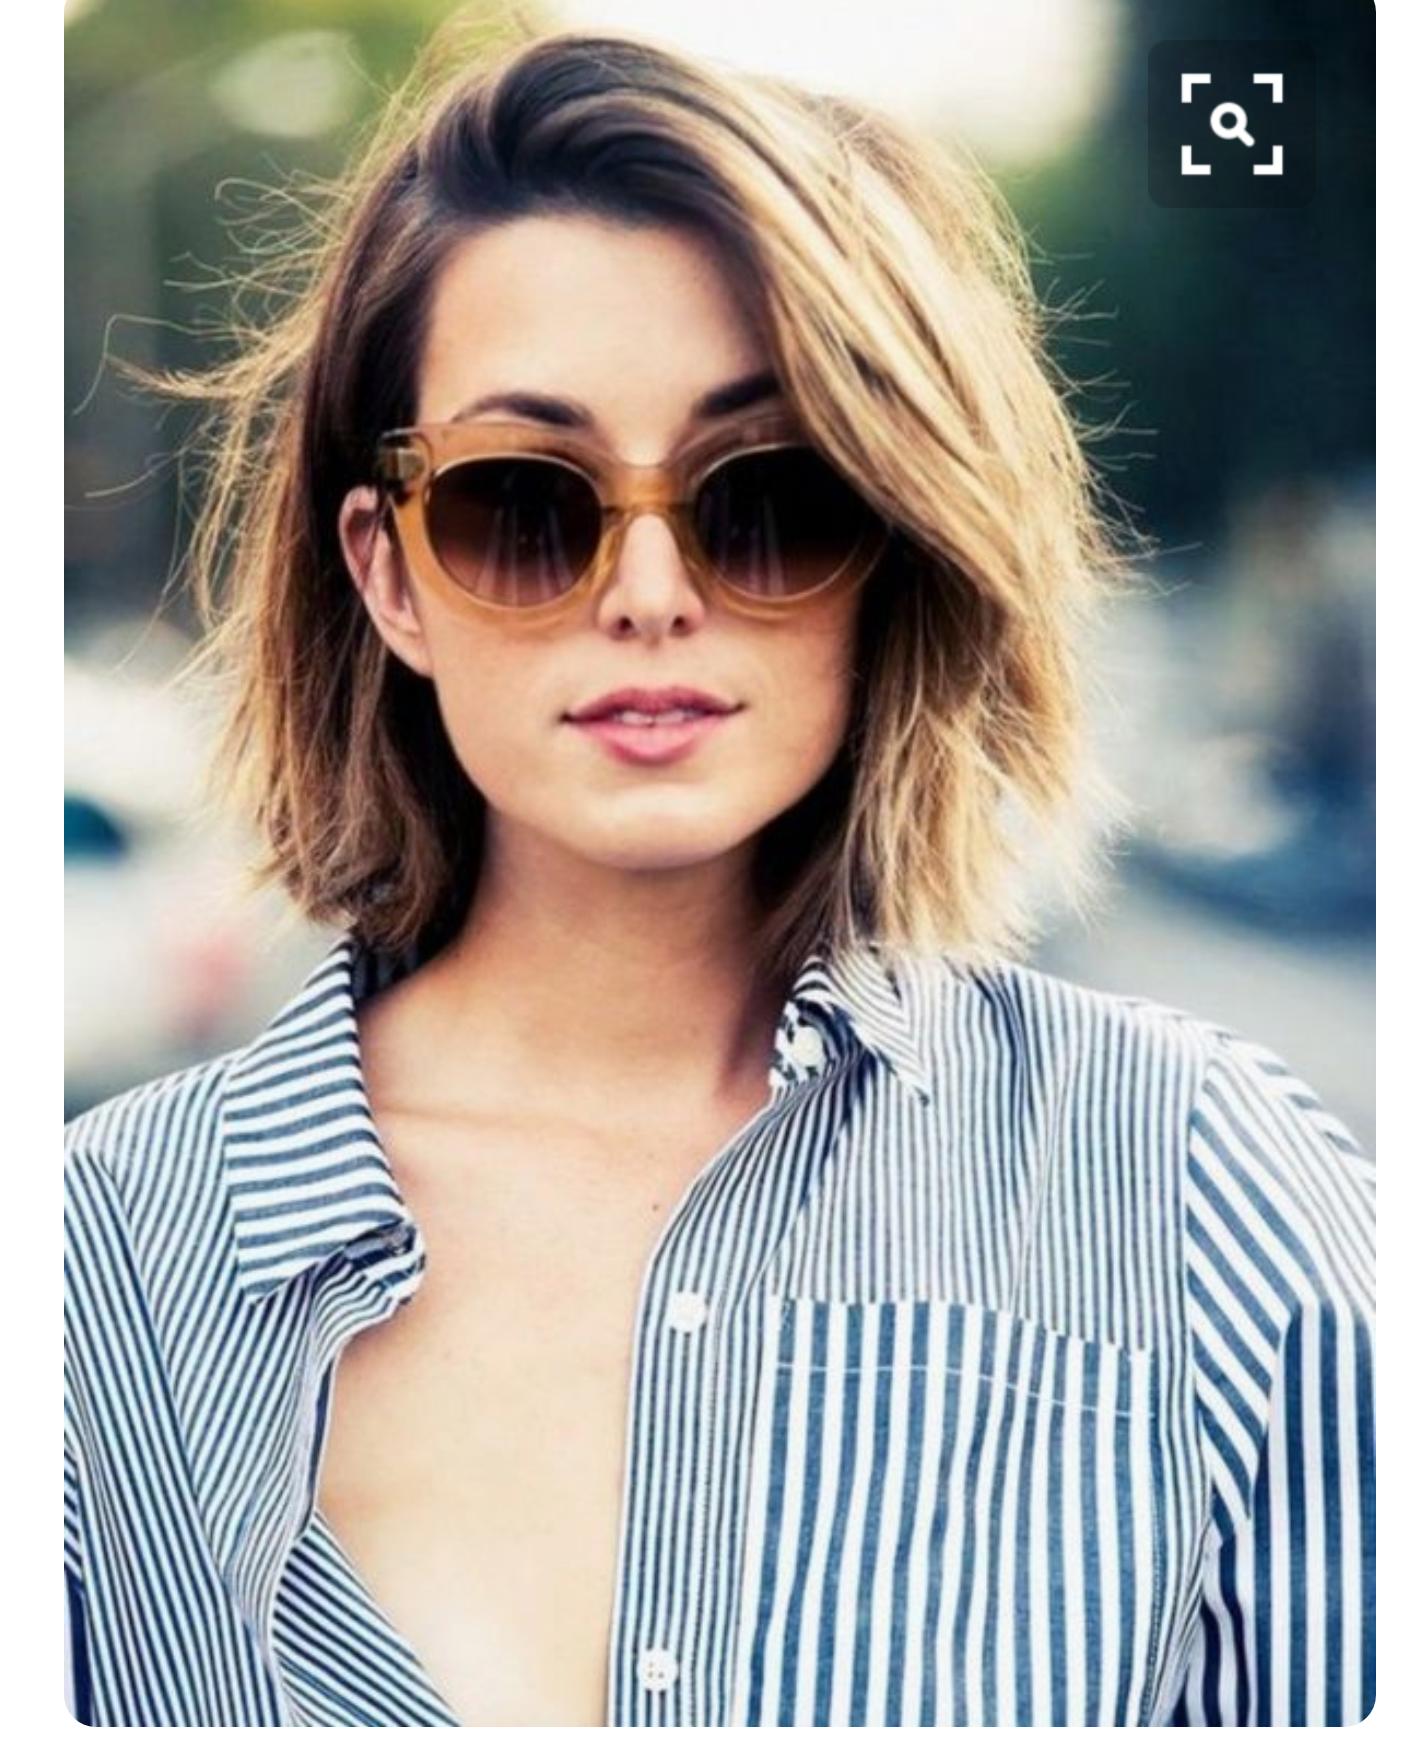 Pin By Taryn Chitwood On Hair Pinterest Hair Short Hair Styles